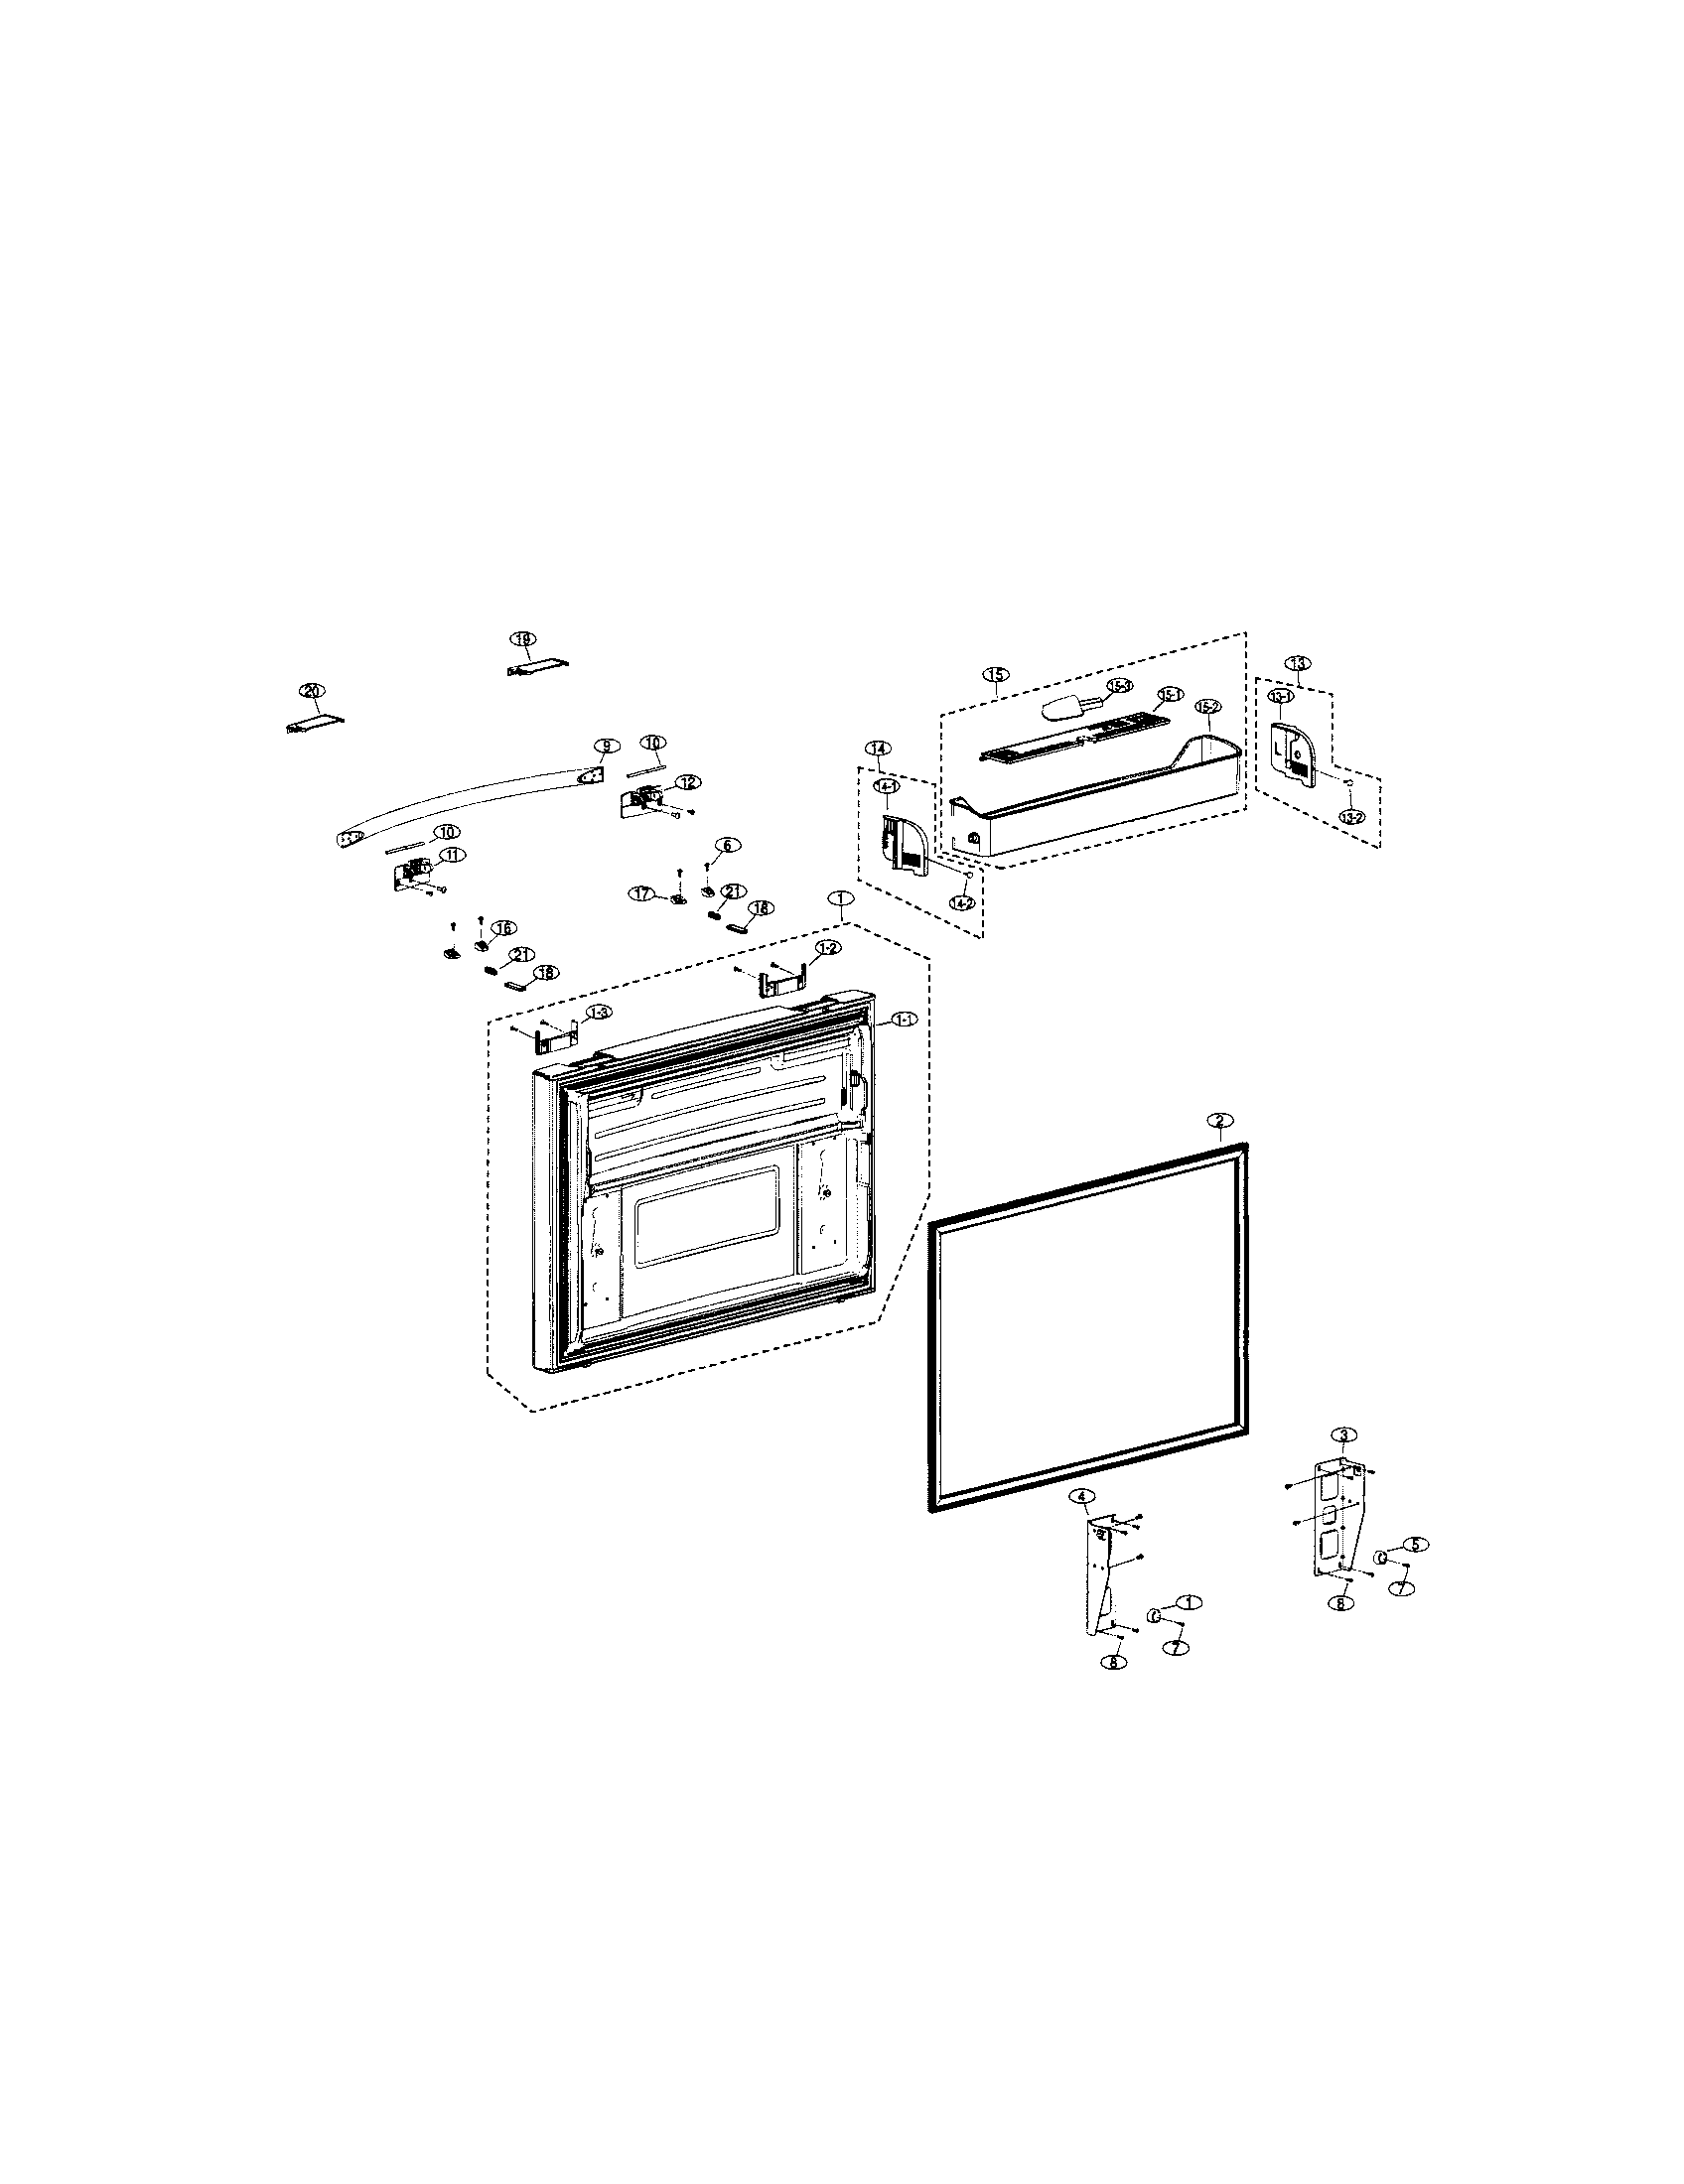 Samsung model RFG298AARS bottom-mount refrigerator genuine